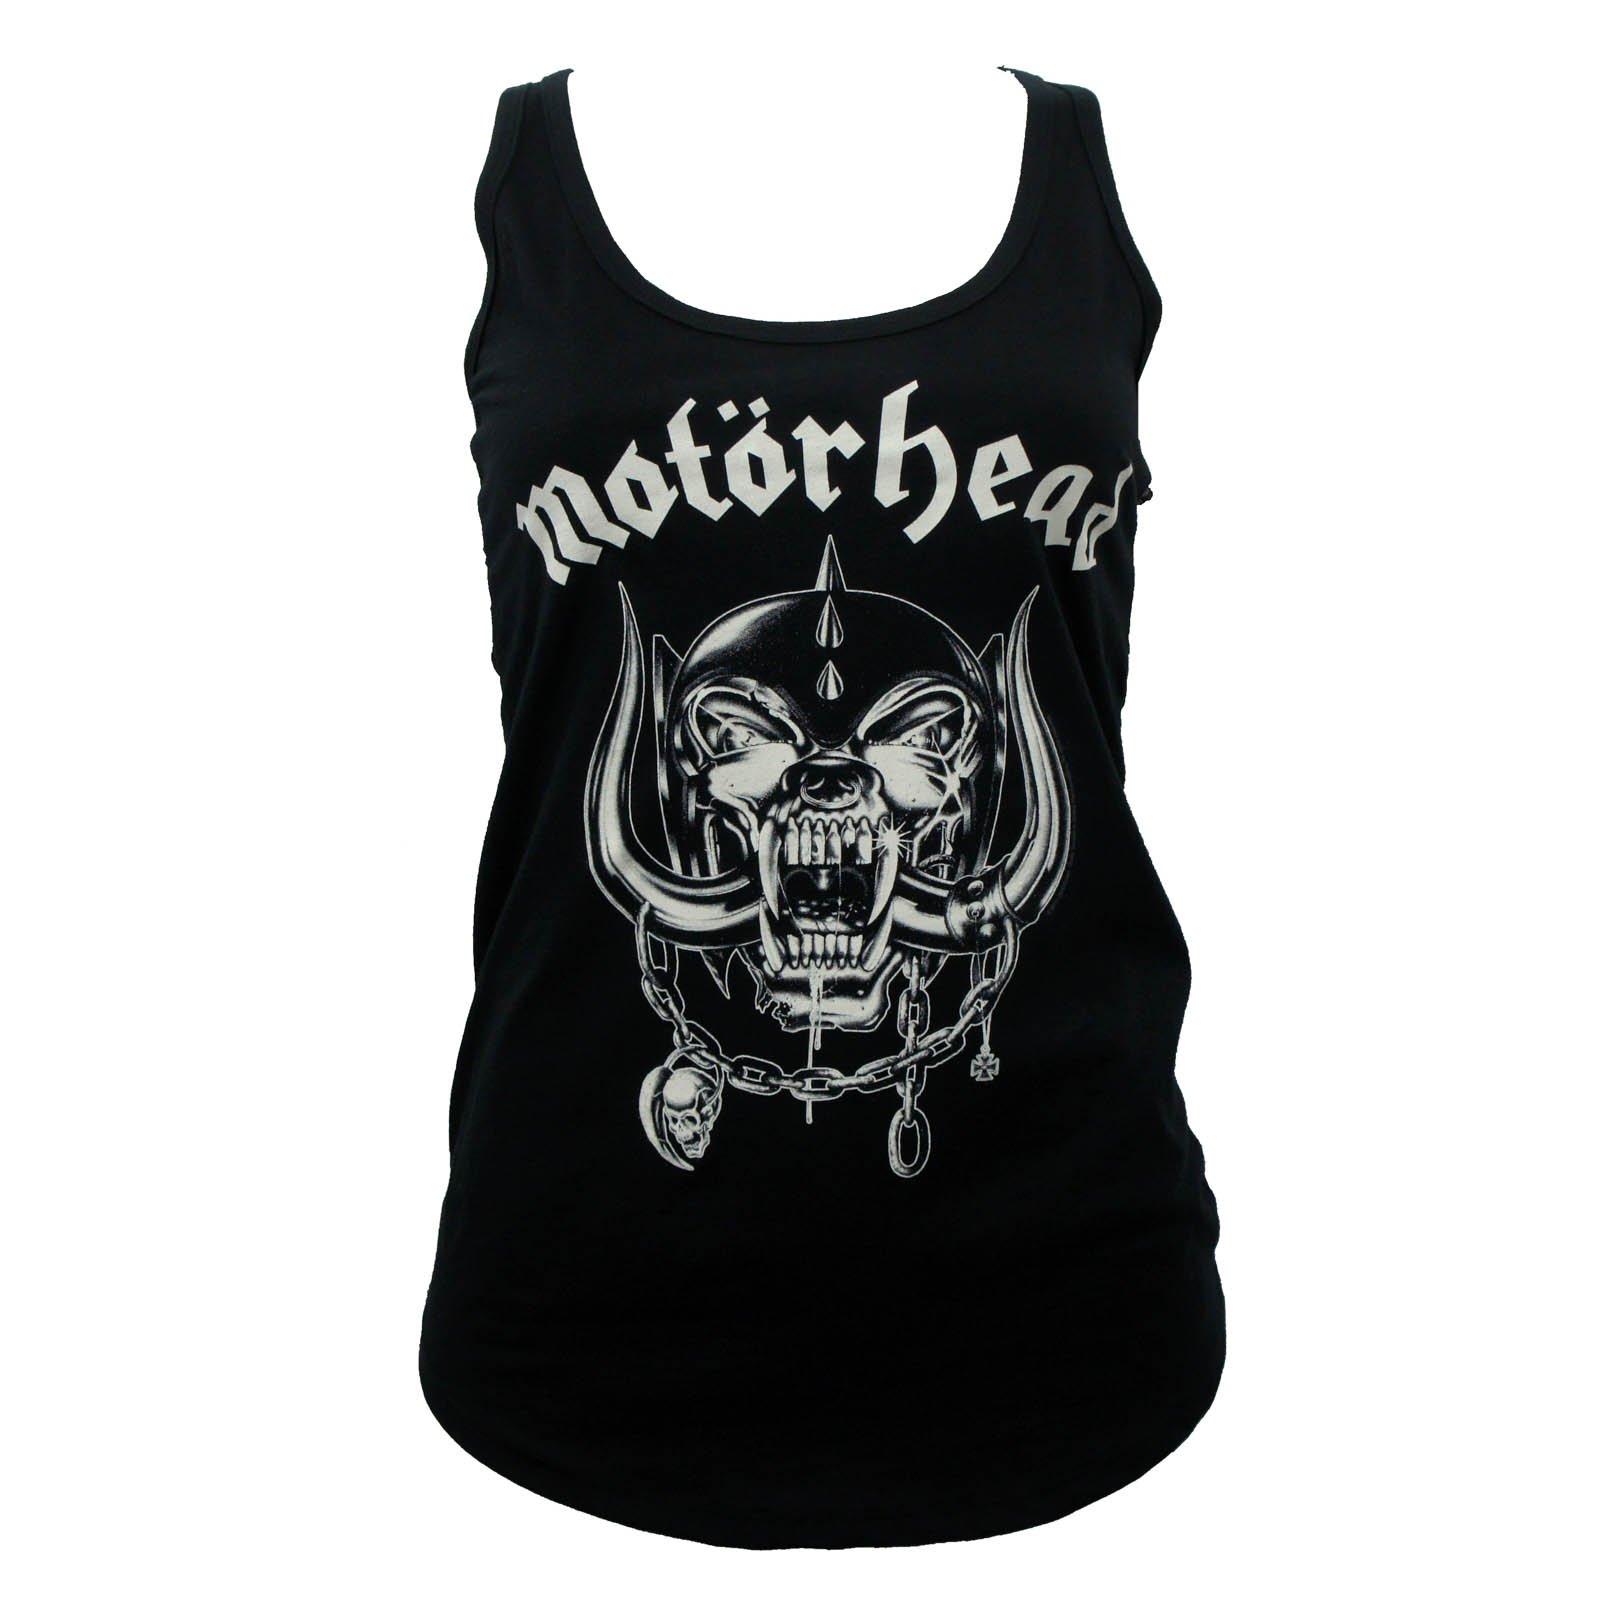 Motorhead Band England Lace Back Girls Tank Top 7916 Shirts